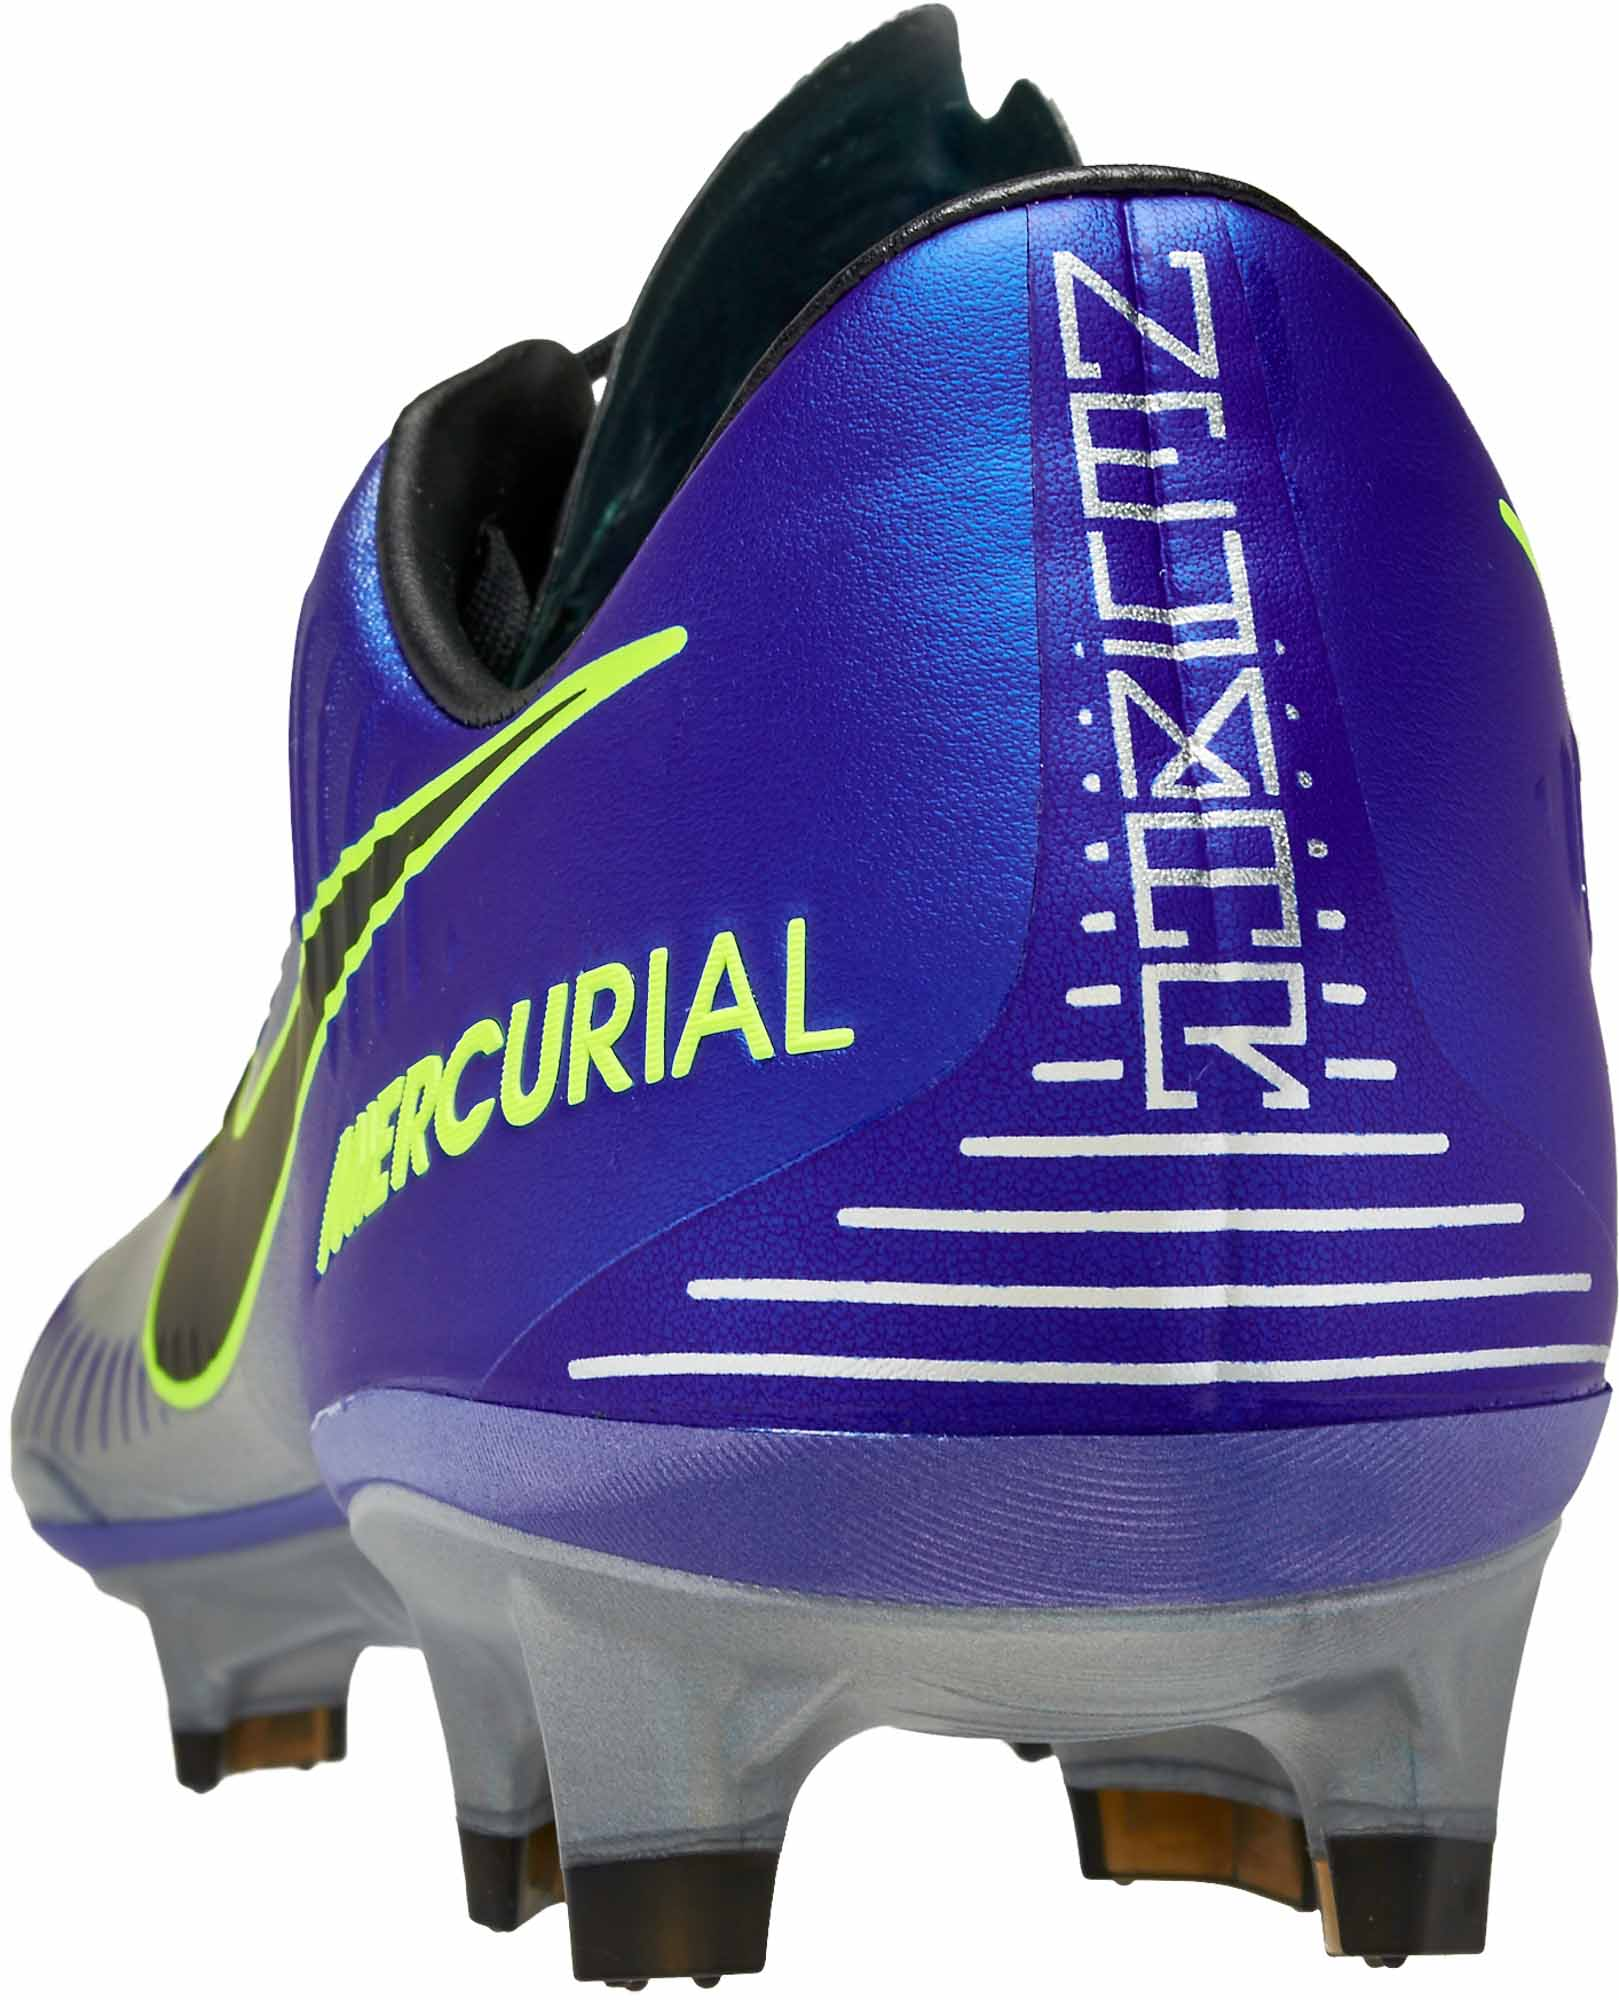 d16541c1bbb4d1 Nike Mercurial Vapor XI FG - Neymar Jr - Racer Blue   Chrome